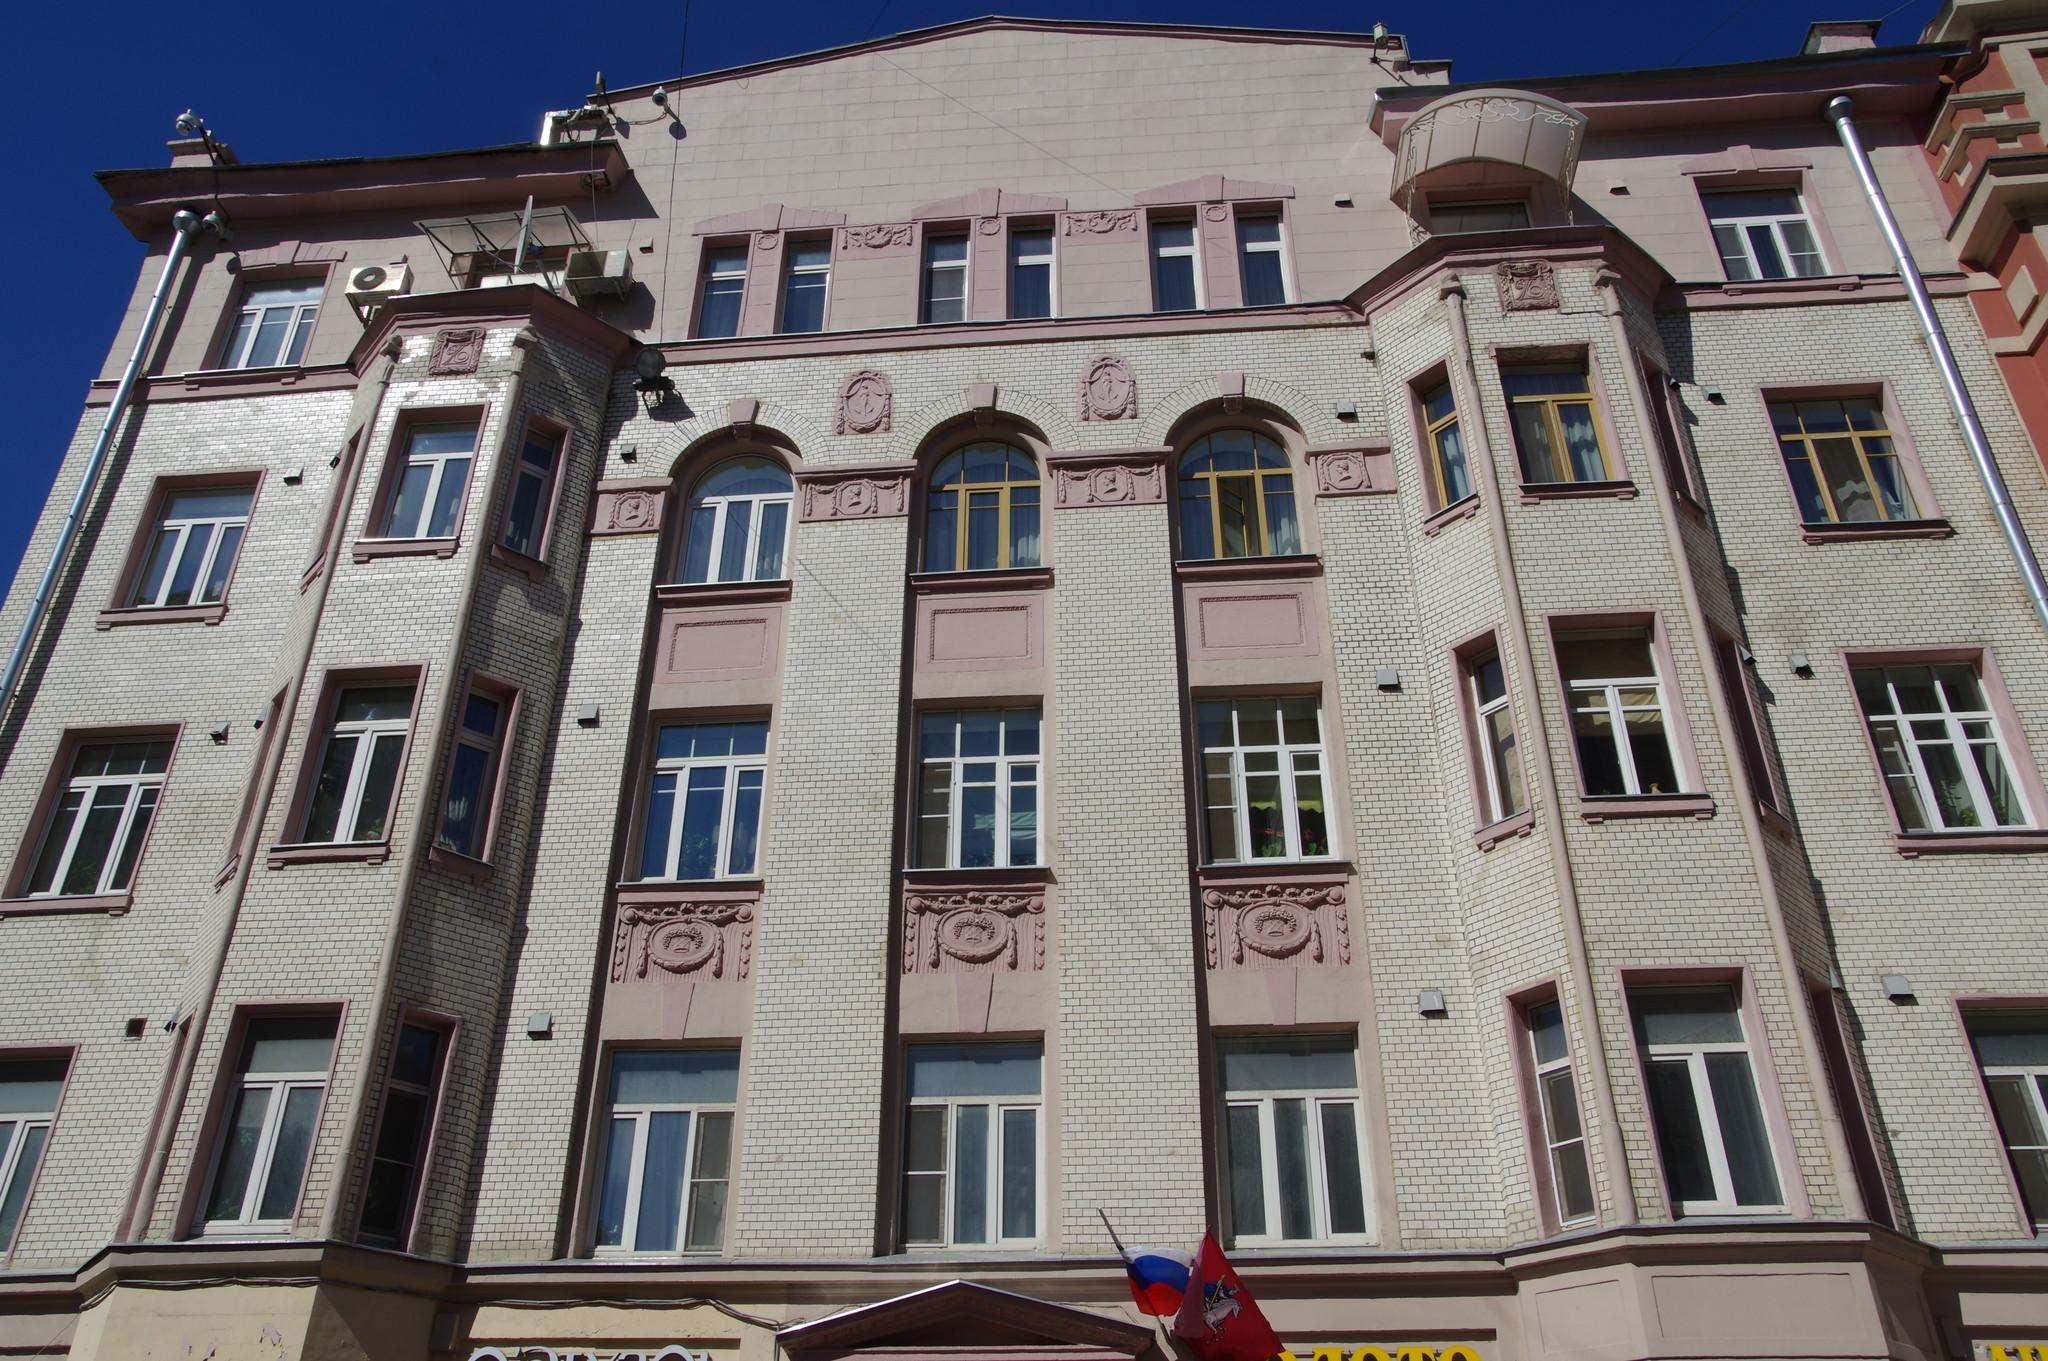 Доходный дом Петра Ивановича Громова (улица Арбат, дом 40)